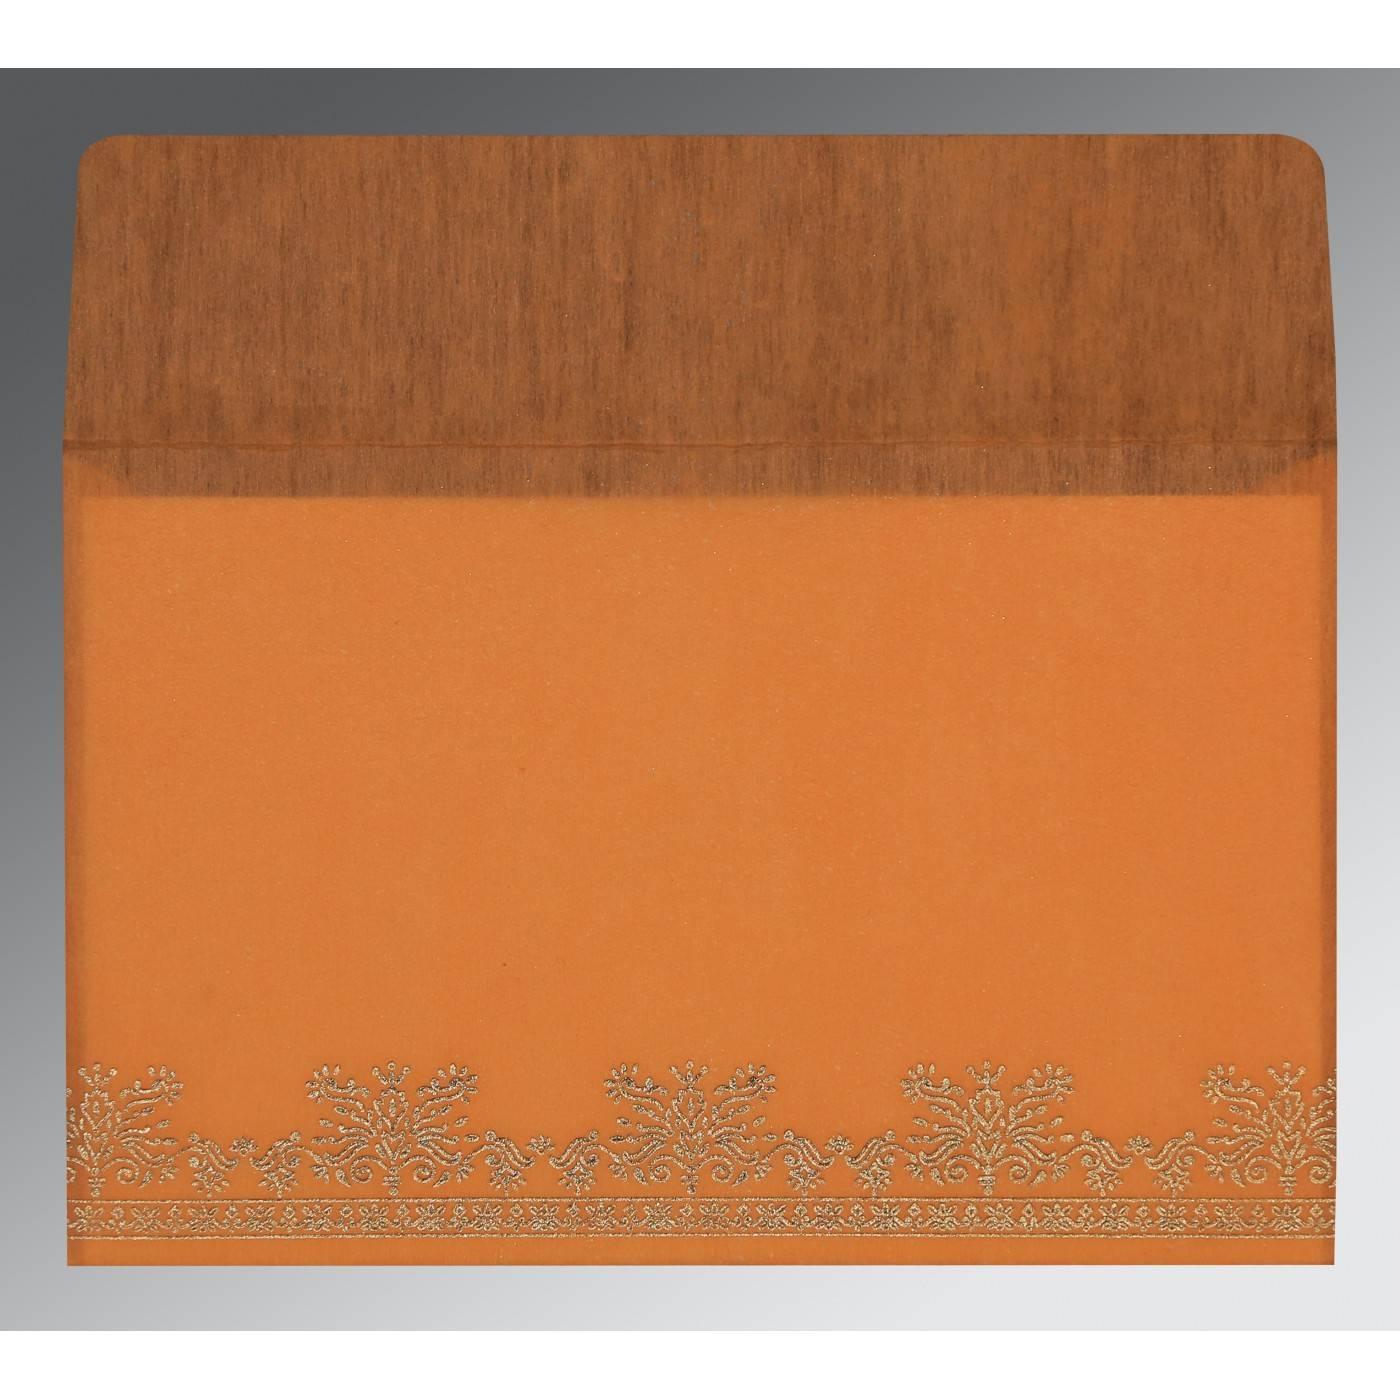 ORANGE WOOLY FOIL STAMPED WEDDING INVITATION : CD-8241H - IndianWeddingCards